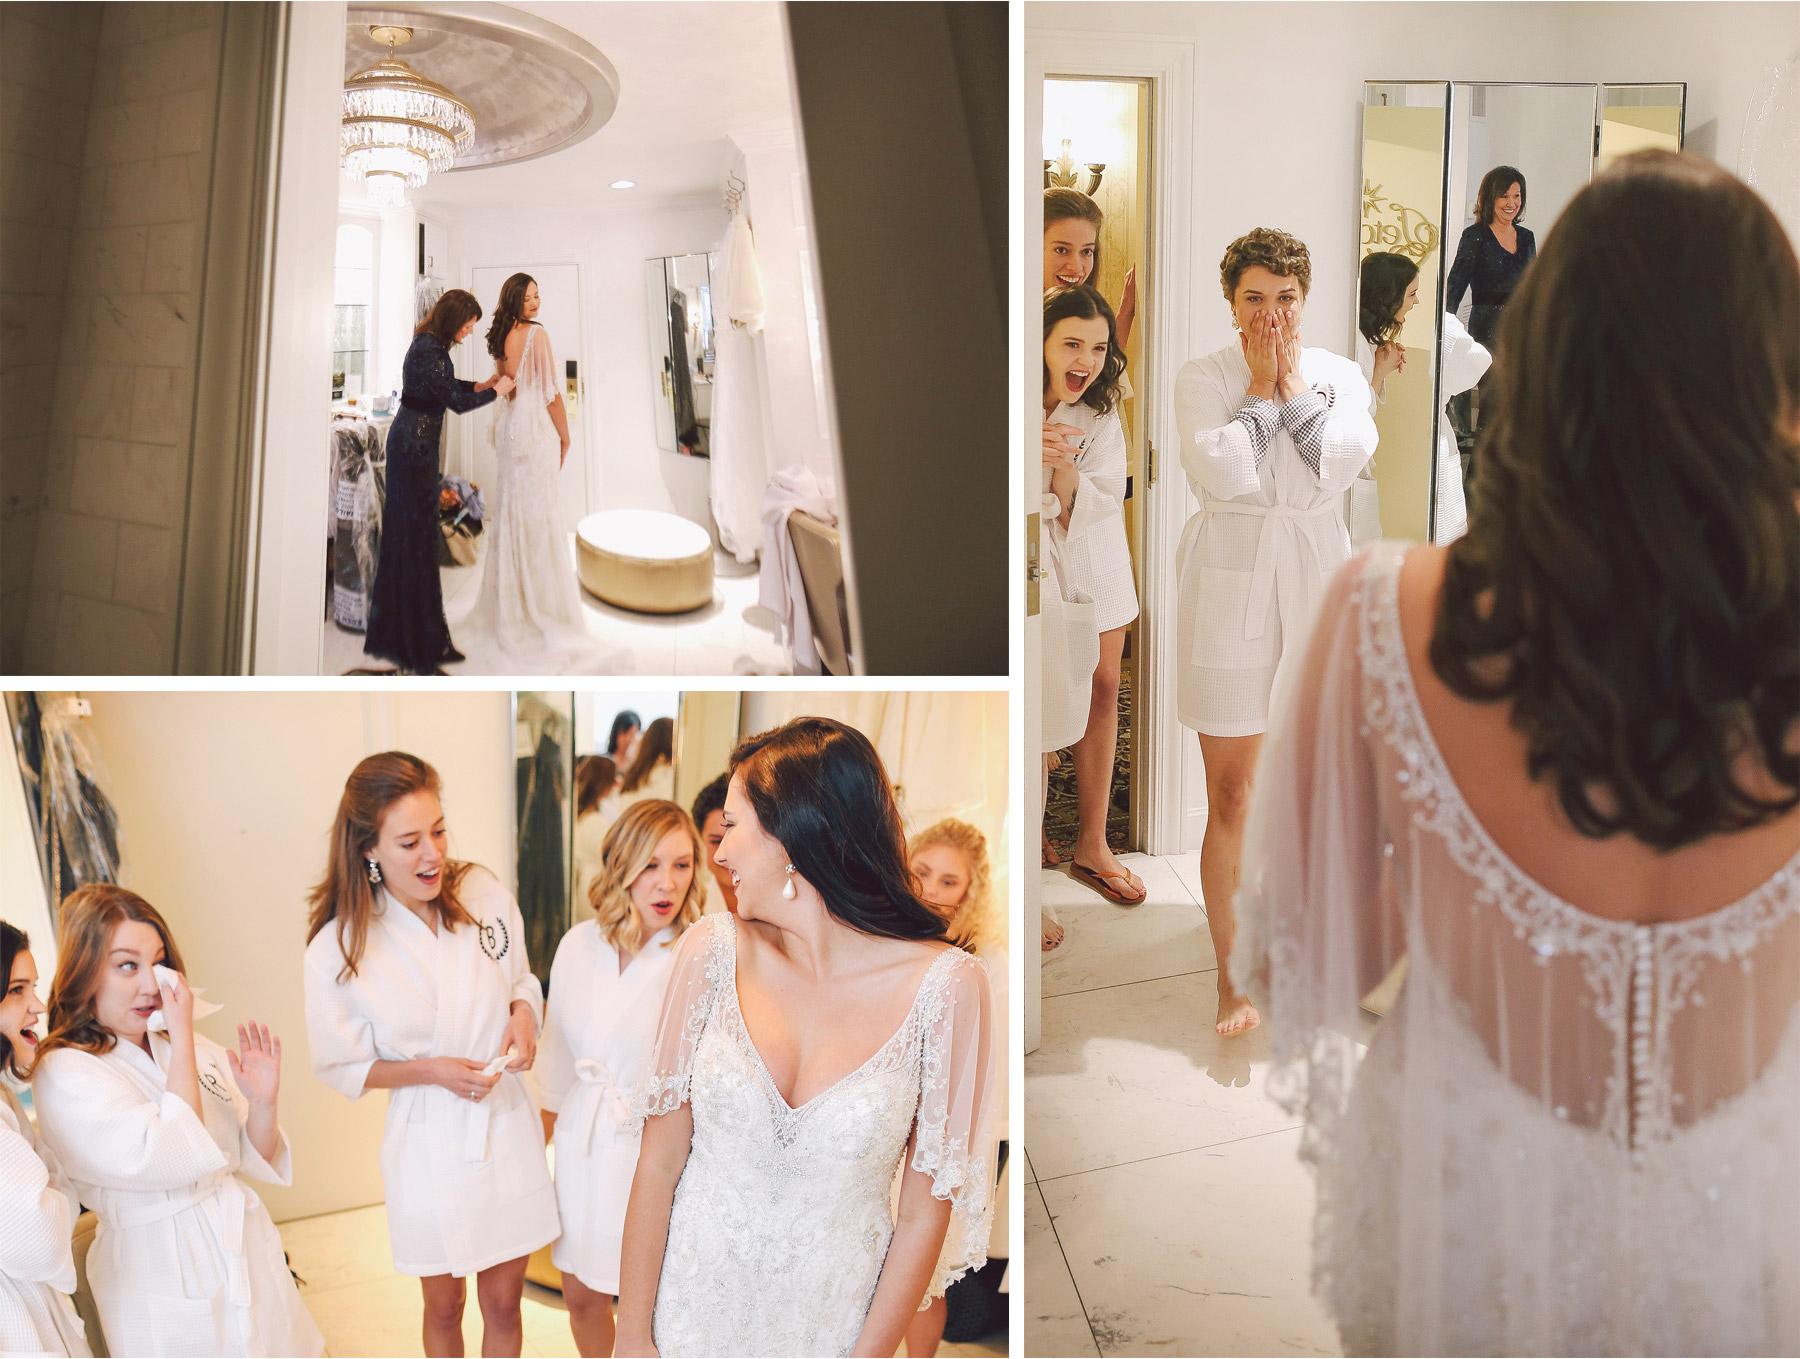 02-Saint-Paul-Minnesota-Wedding-Photography-by-Vick-Photography-Saint-Paul-Hotel-Bridesmaids-Robes-Getting-Ready-Wedding-Morning-Sami-and-Nick.jpg